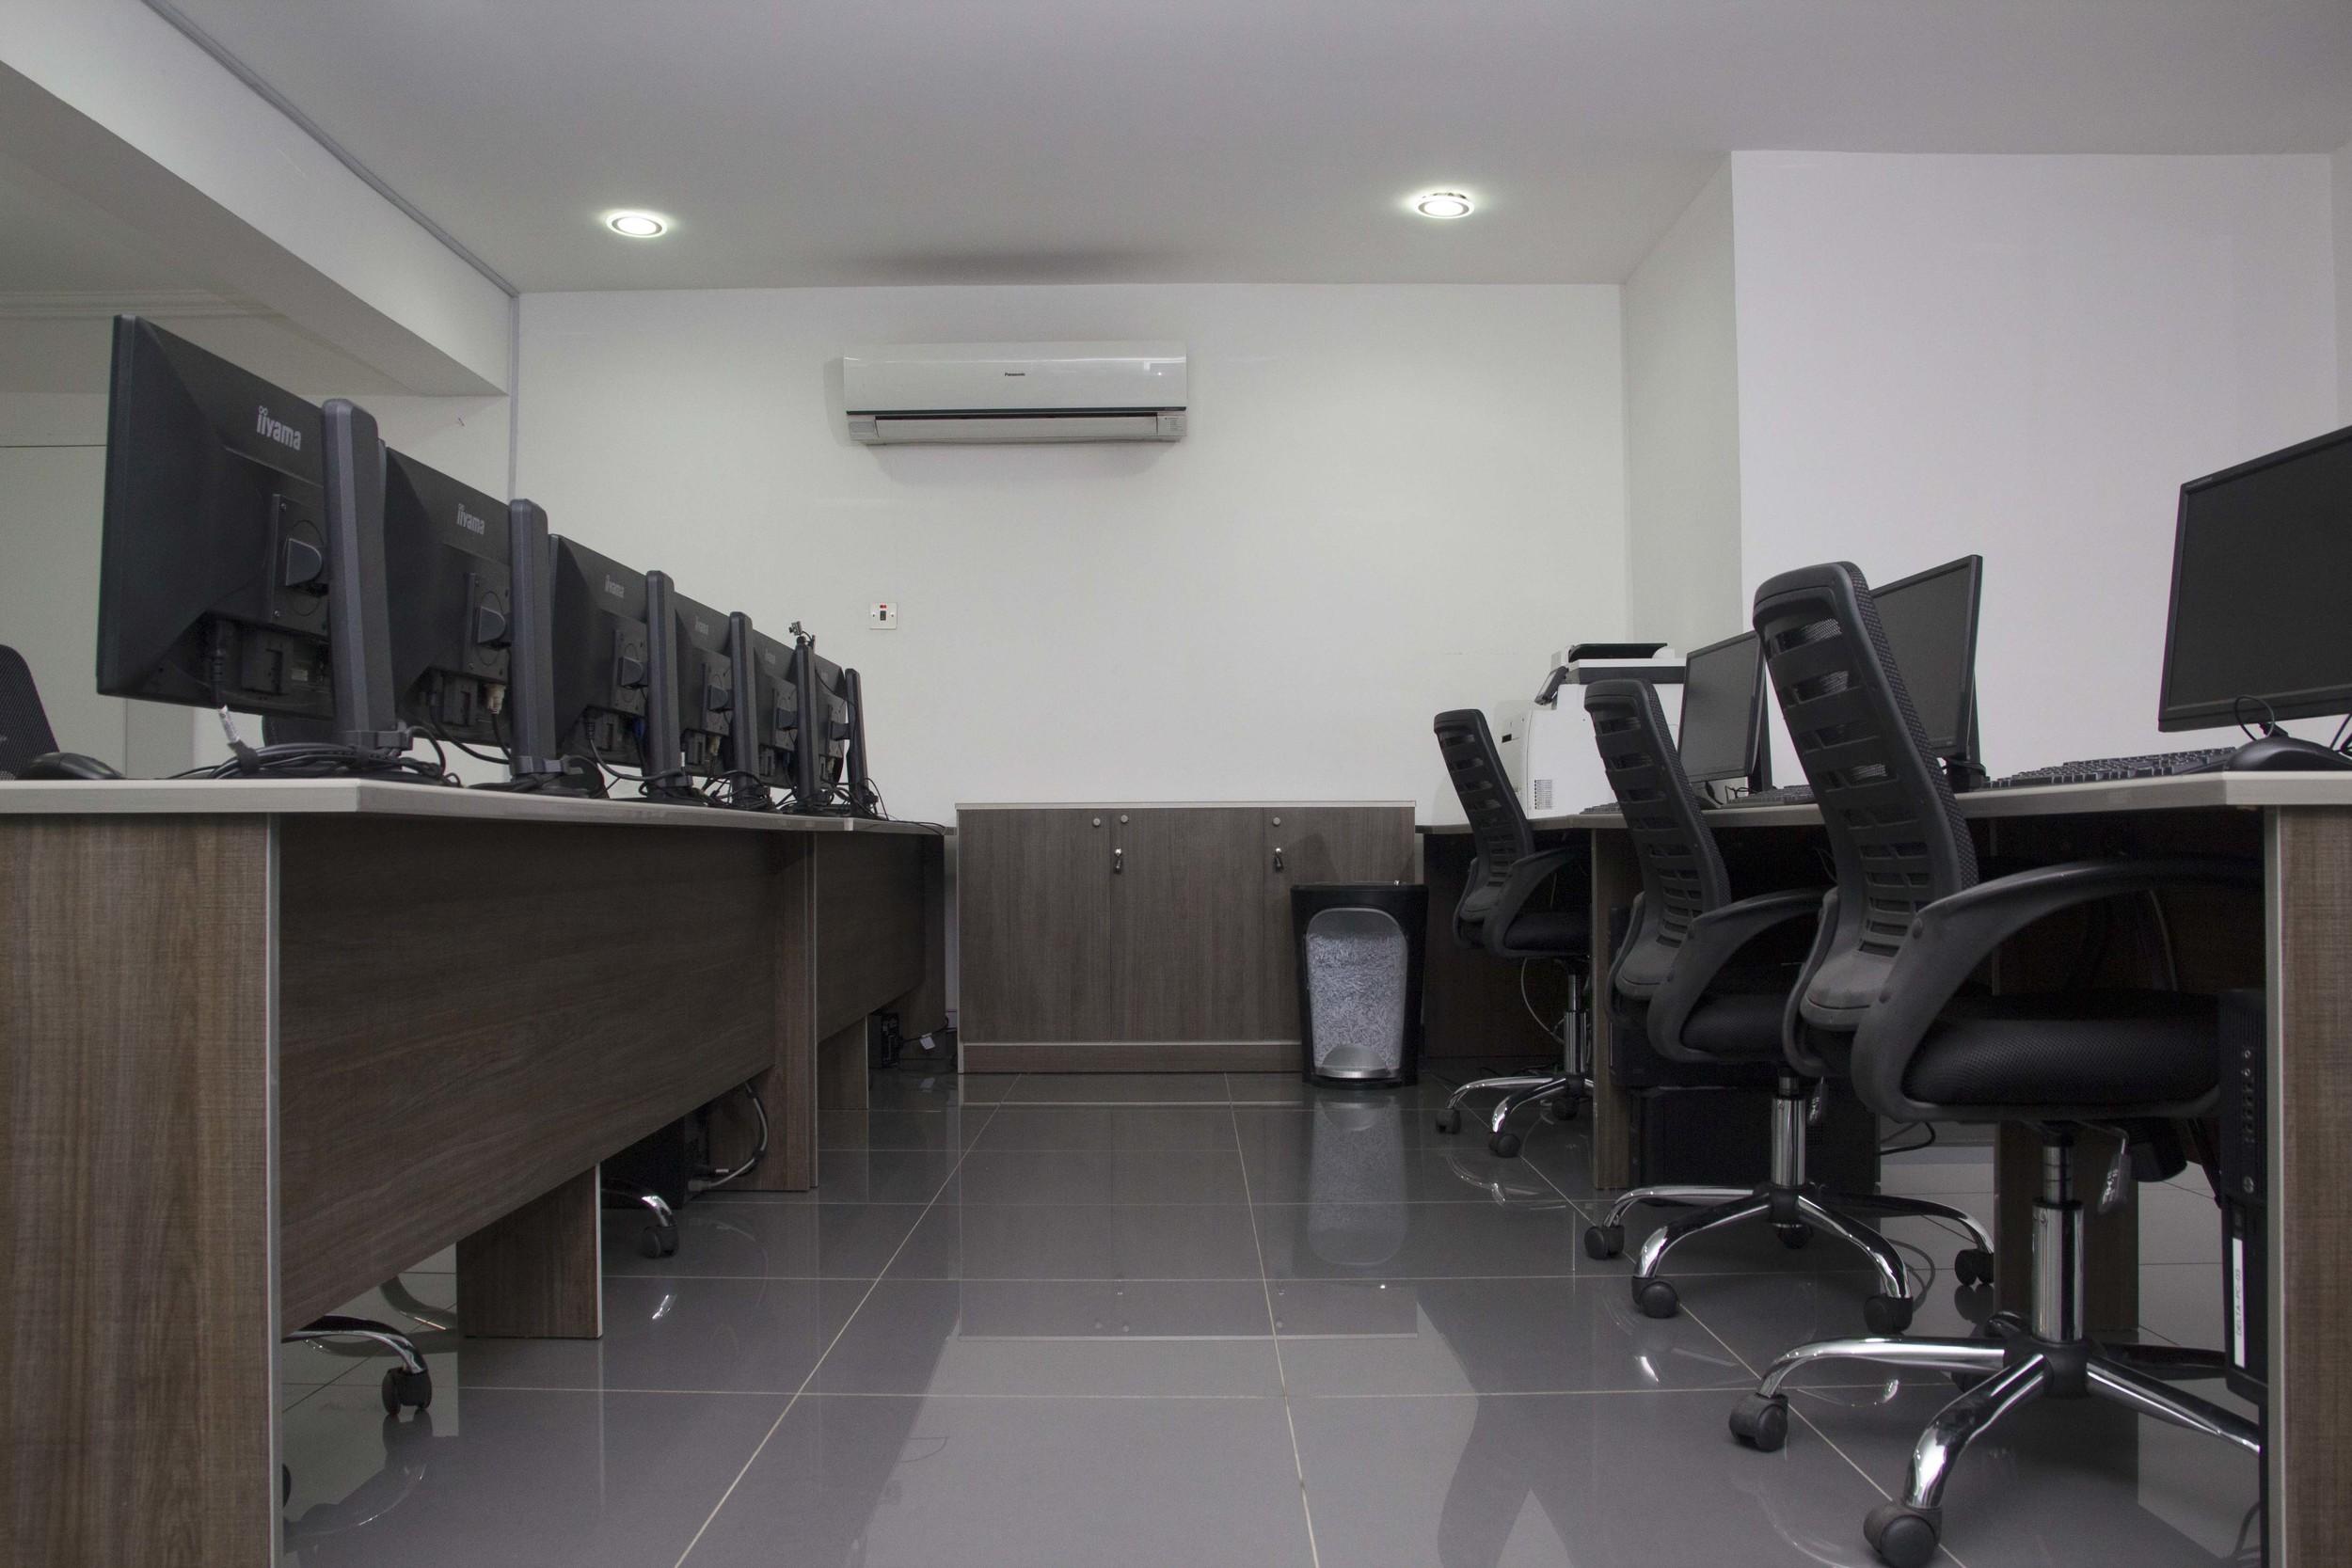 Row of Computers.jpg